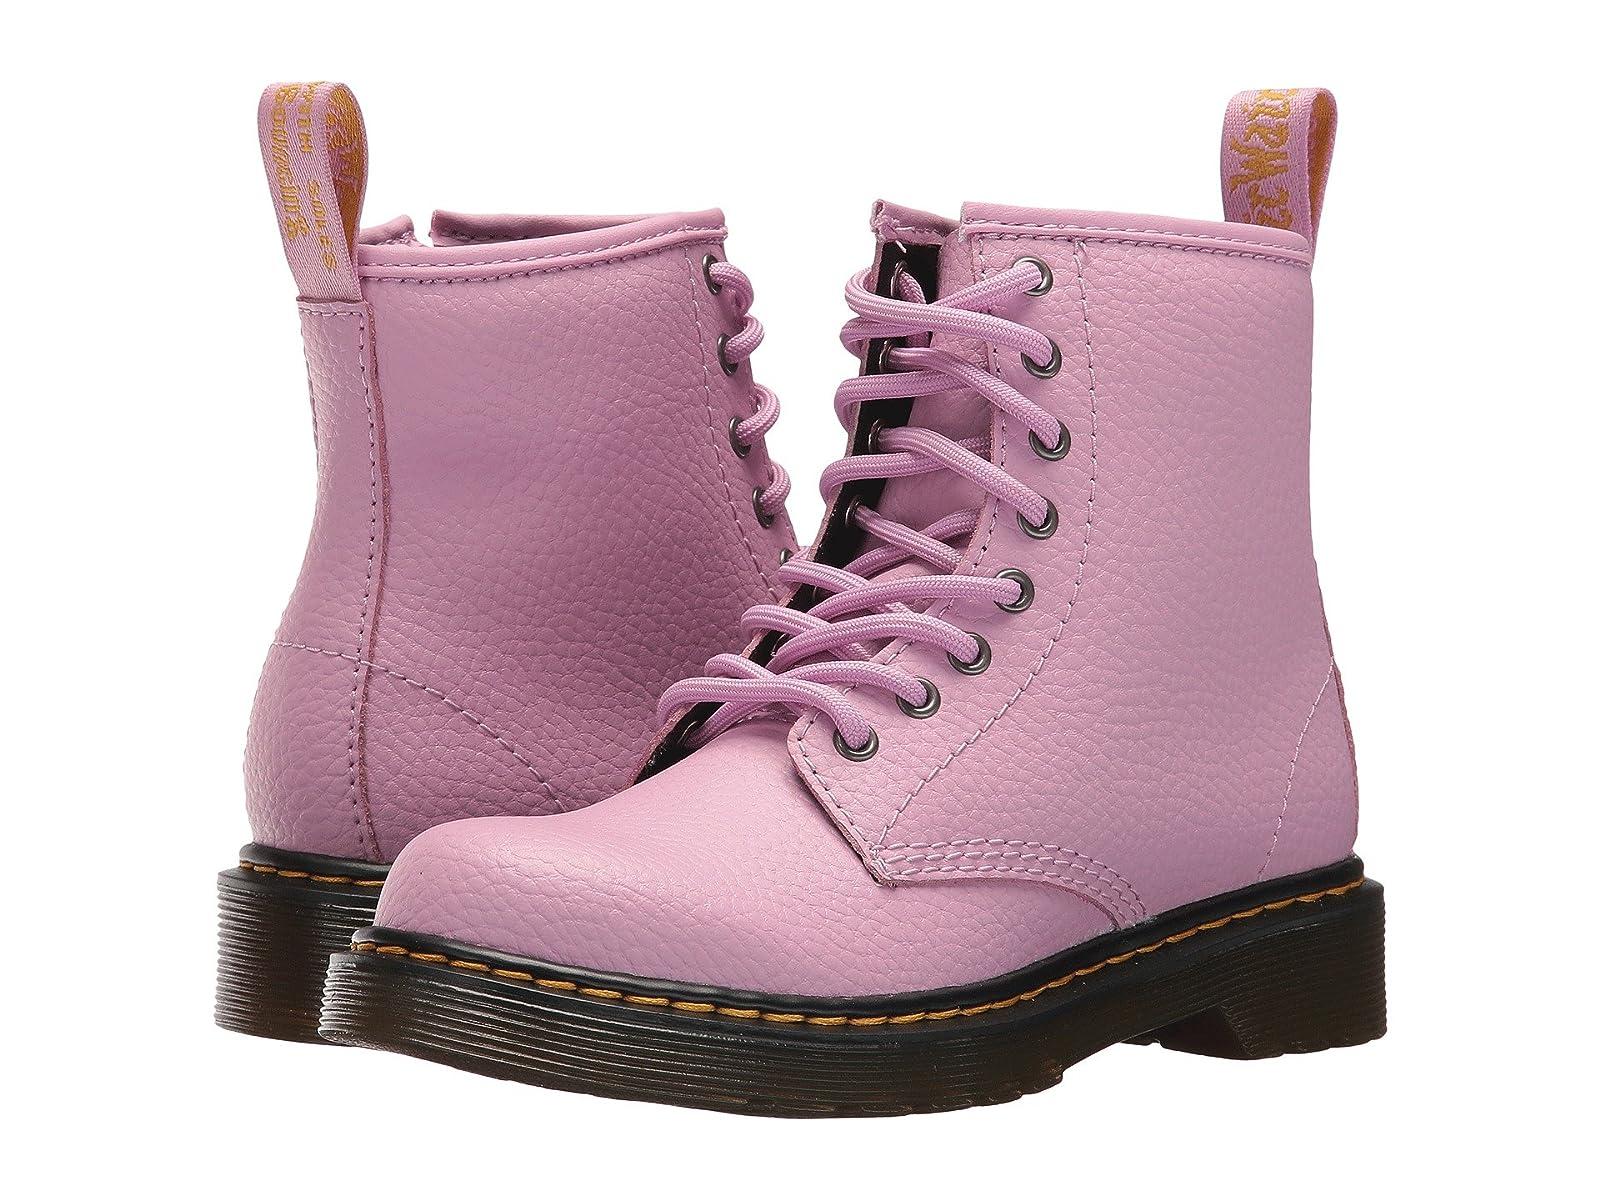 Dr. Martens Kid's Collection Delaney PBL (Little Kid/Big Kid)Affordable and distinctive shoes